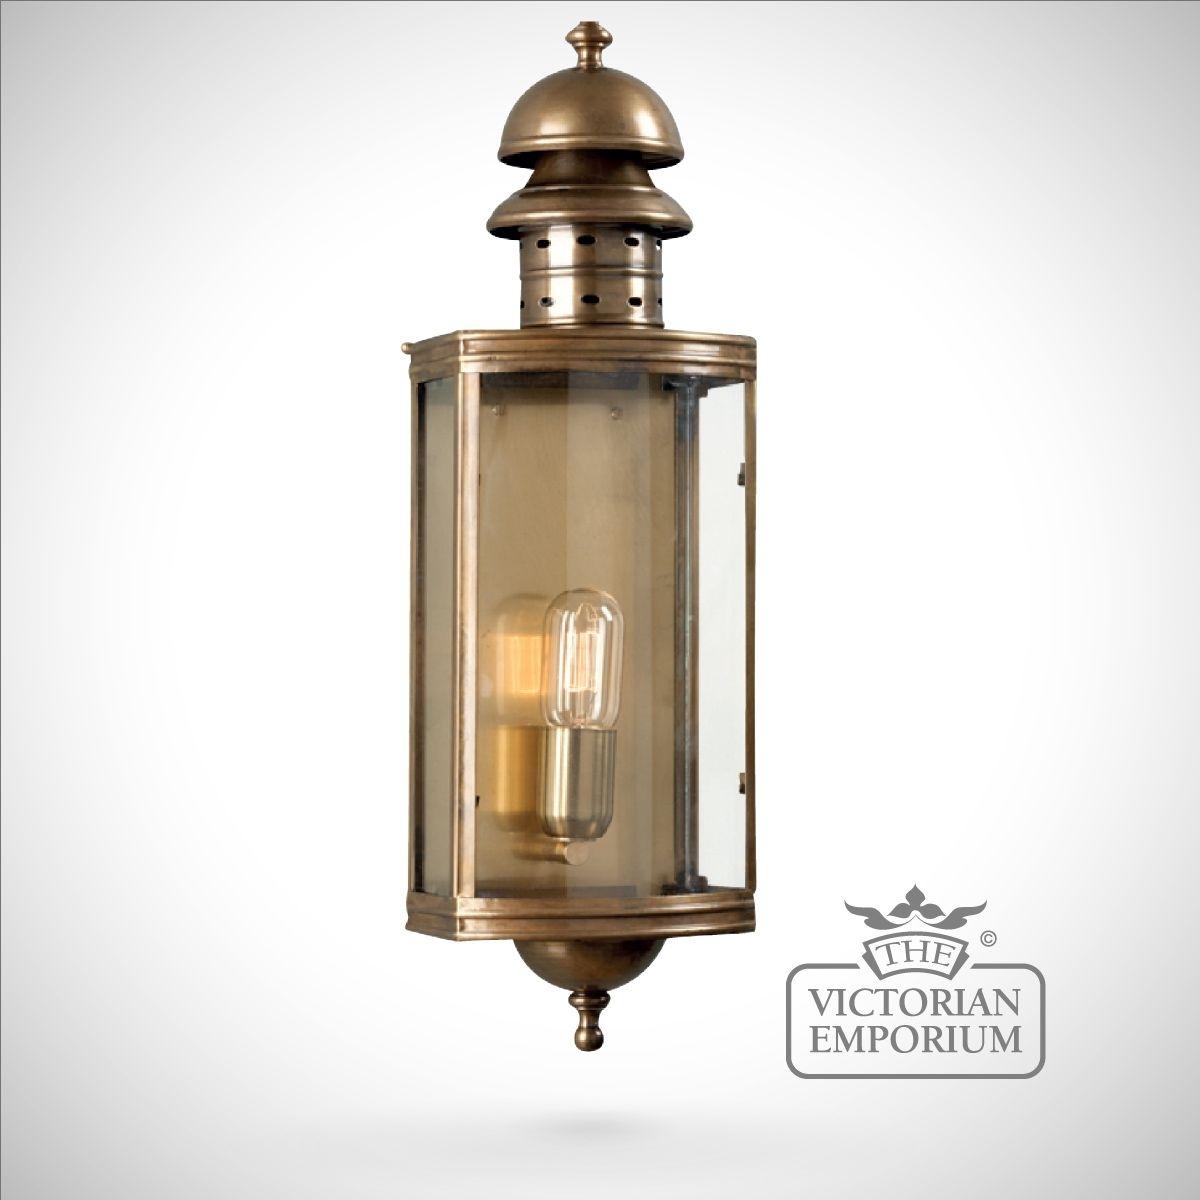 Antique 1920 Ceiling Light Fixtures Ebay Outdoor Wall Lights Vintage regarding Antique Outdoor Lanterns (Image 2 of 20)